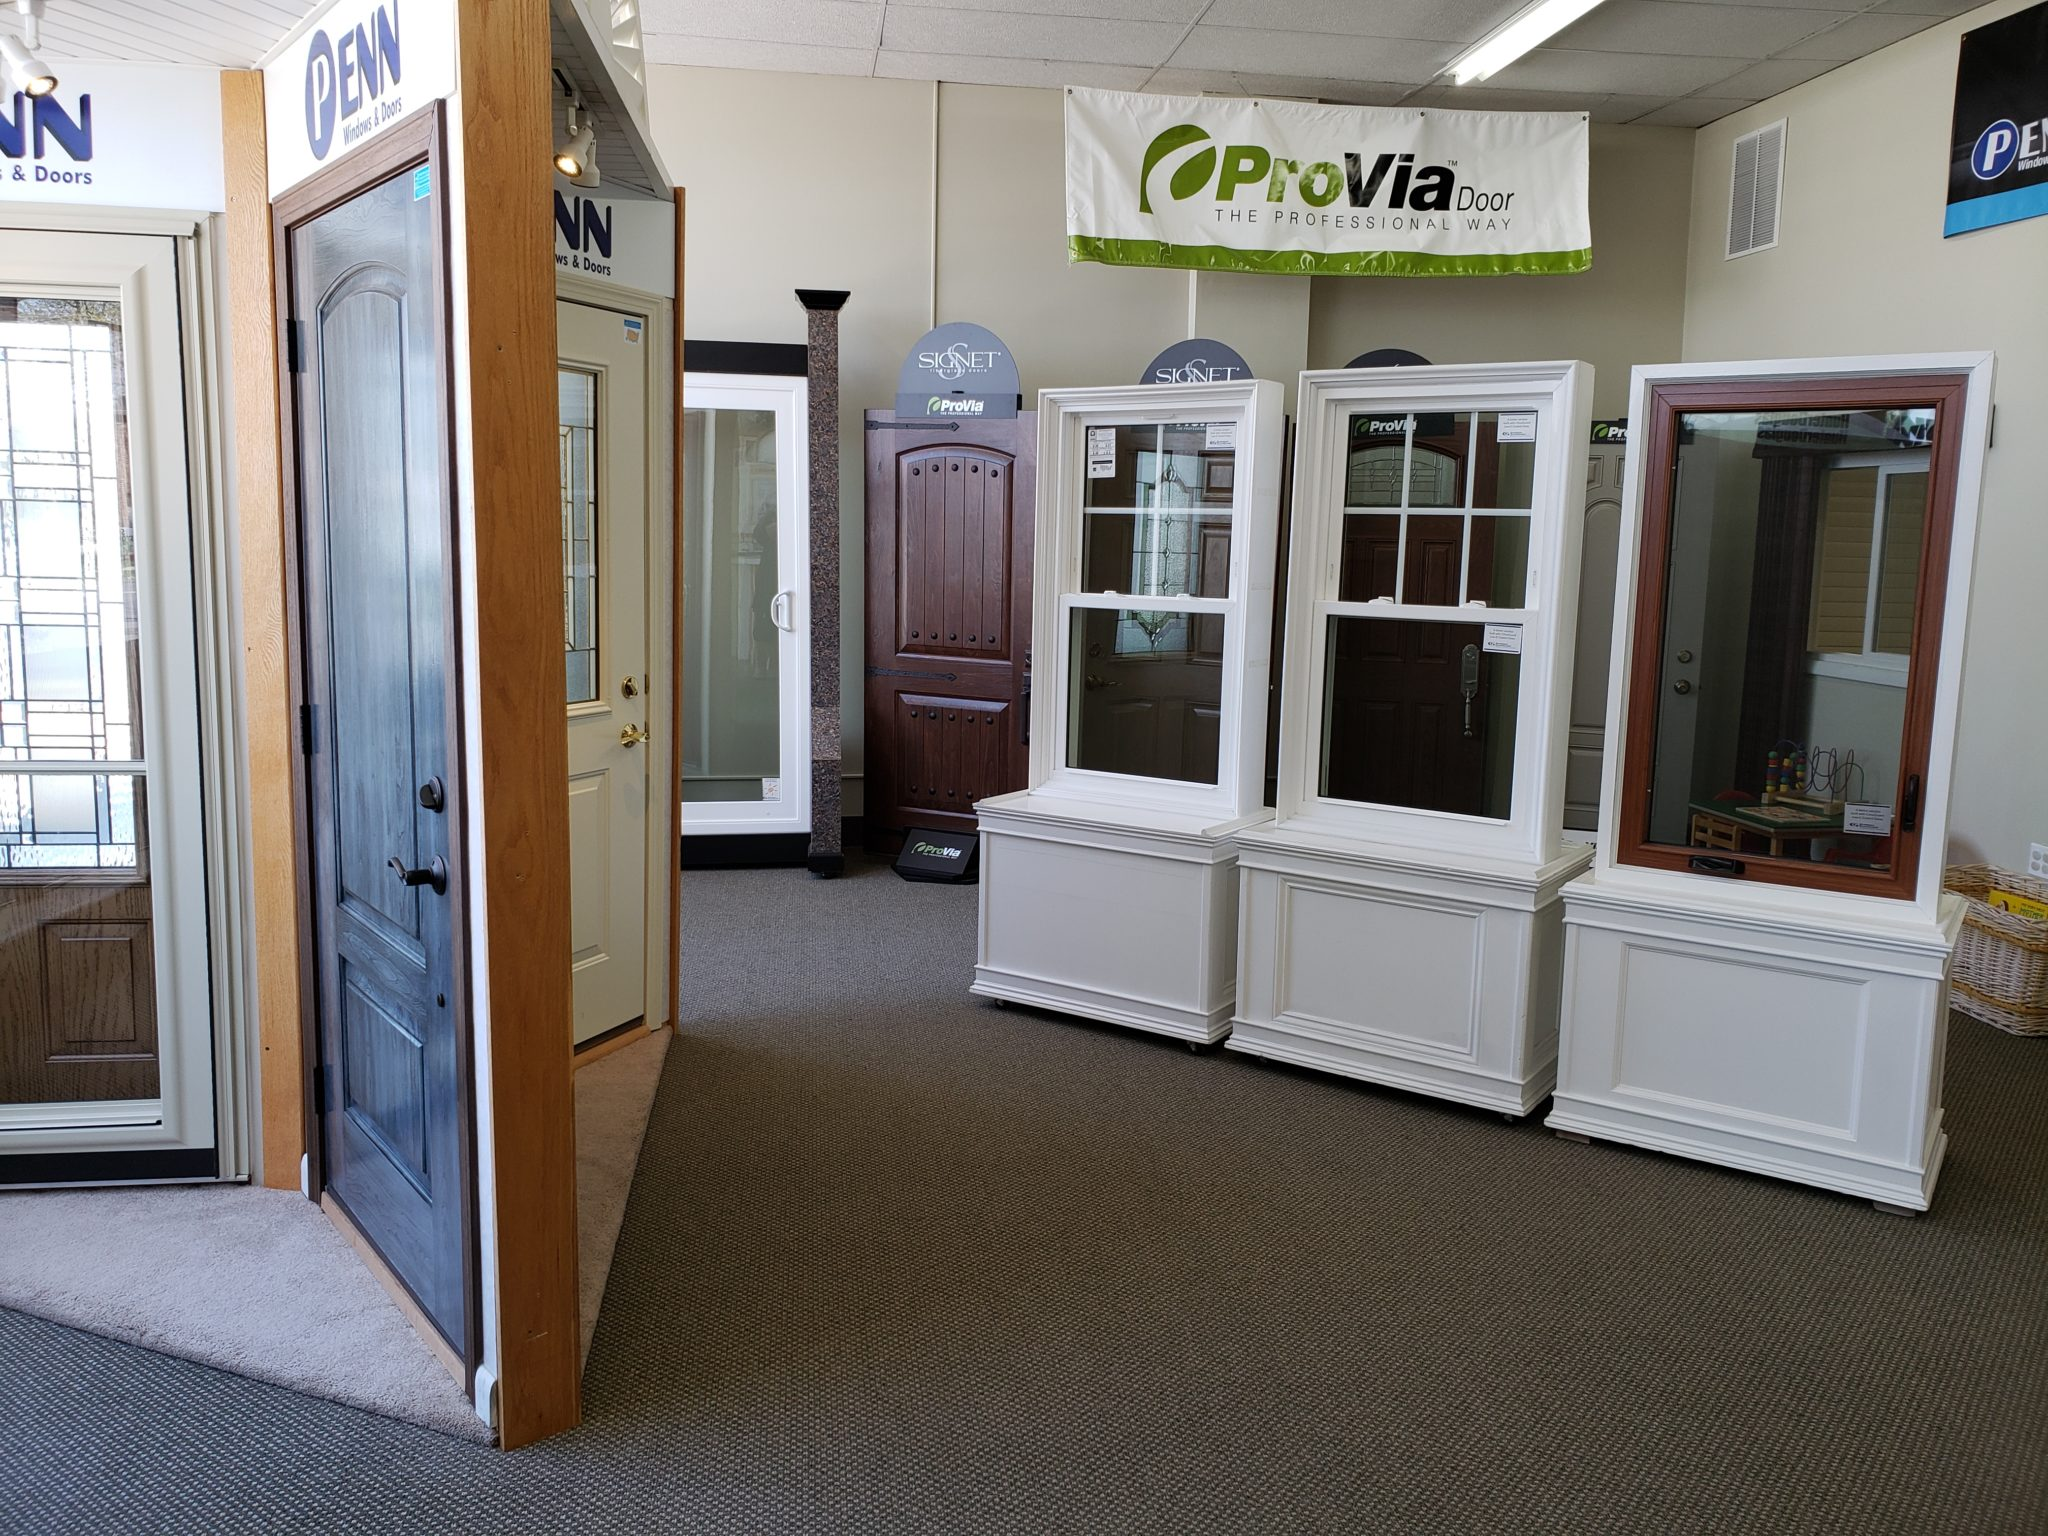 Penn Windows & Doors showroom